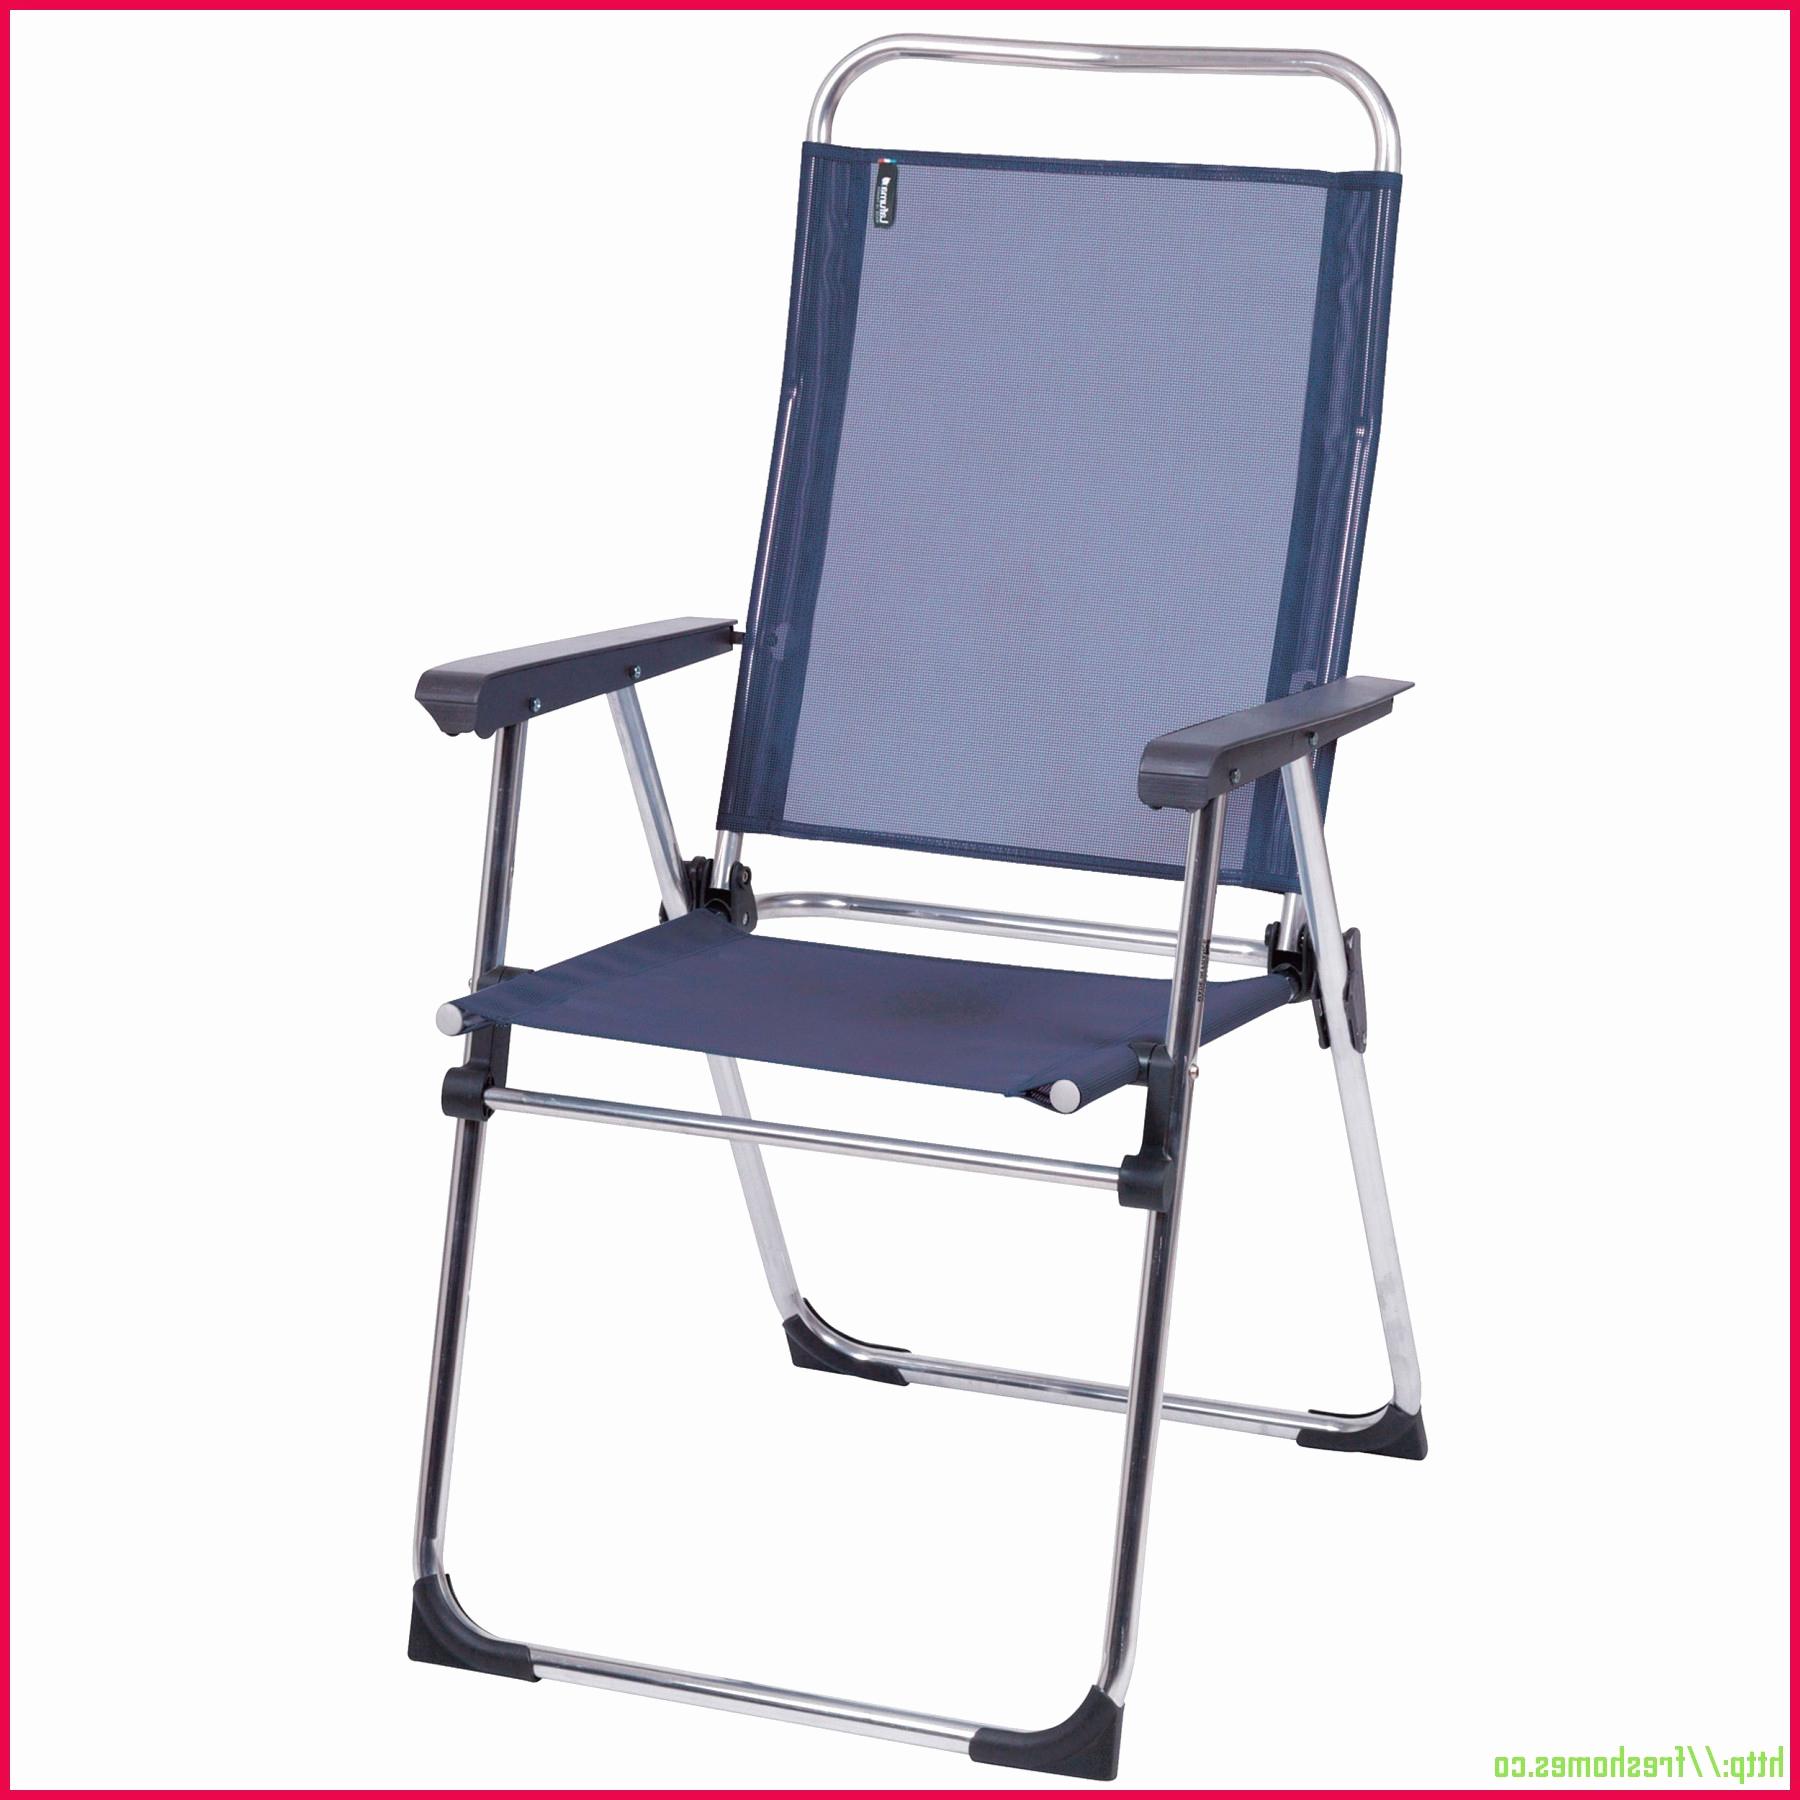 chaise de plage carrefour impressionnant galerie chaise. Black Bedroom Furniture Sets. Home Design Ideas